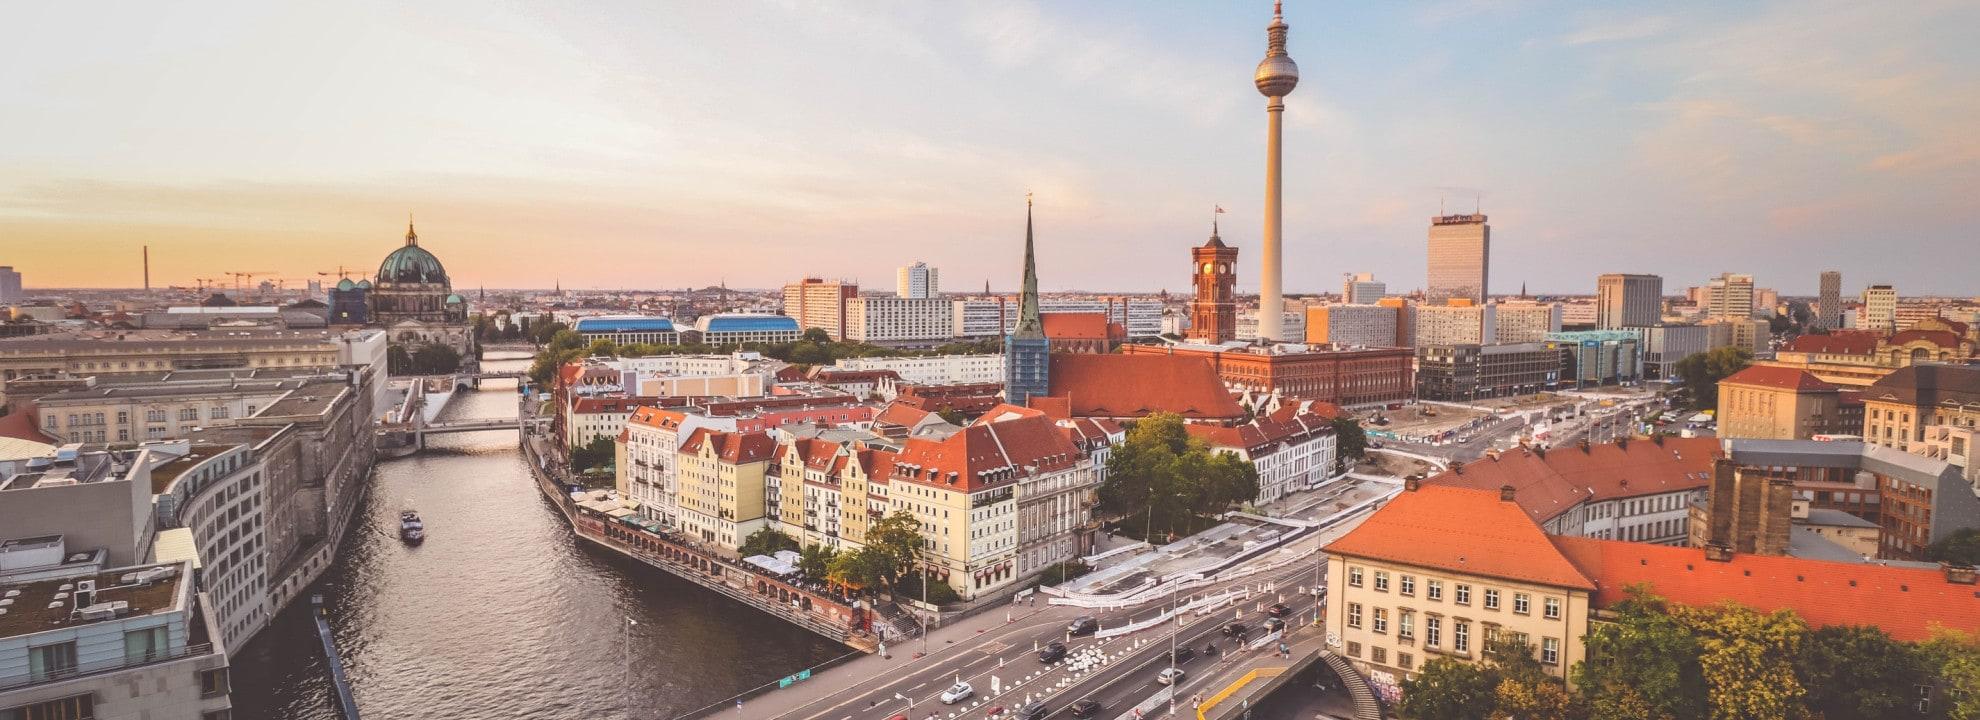 Laravel Agentur Berlin